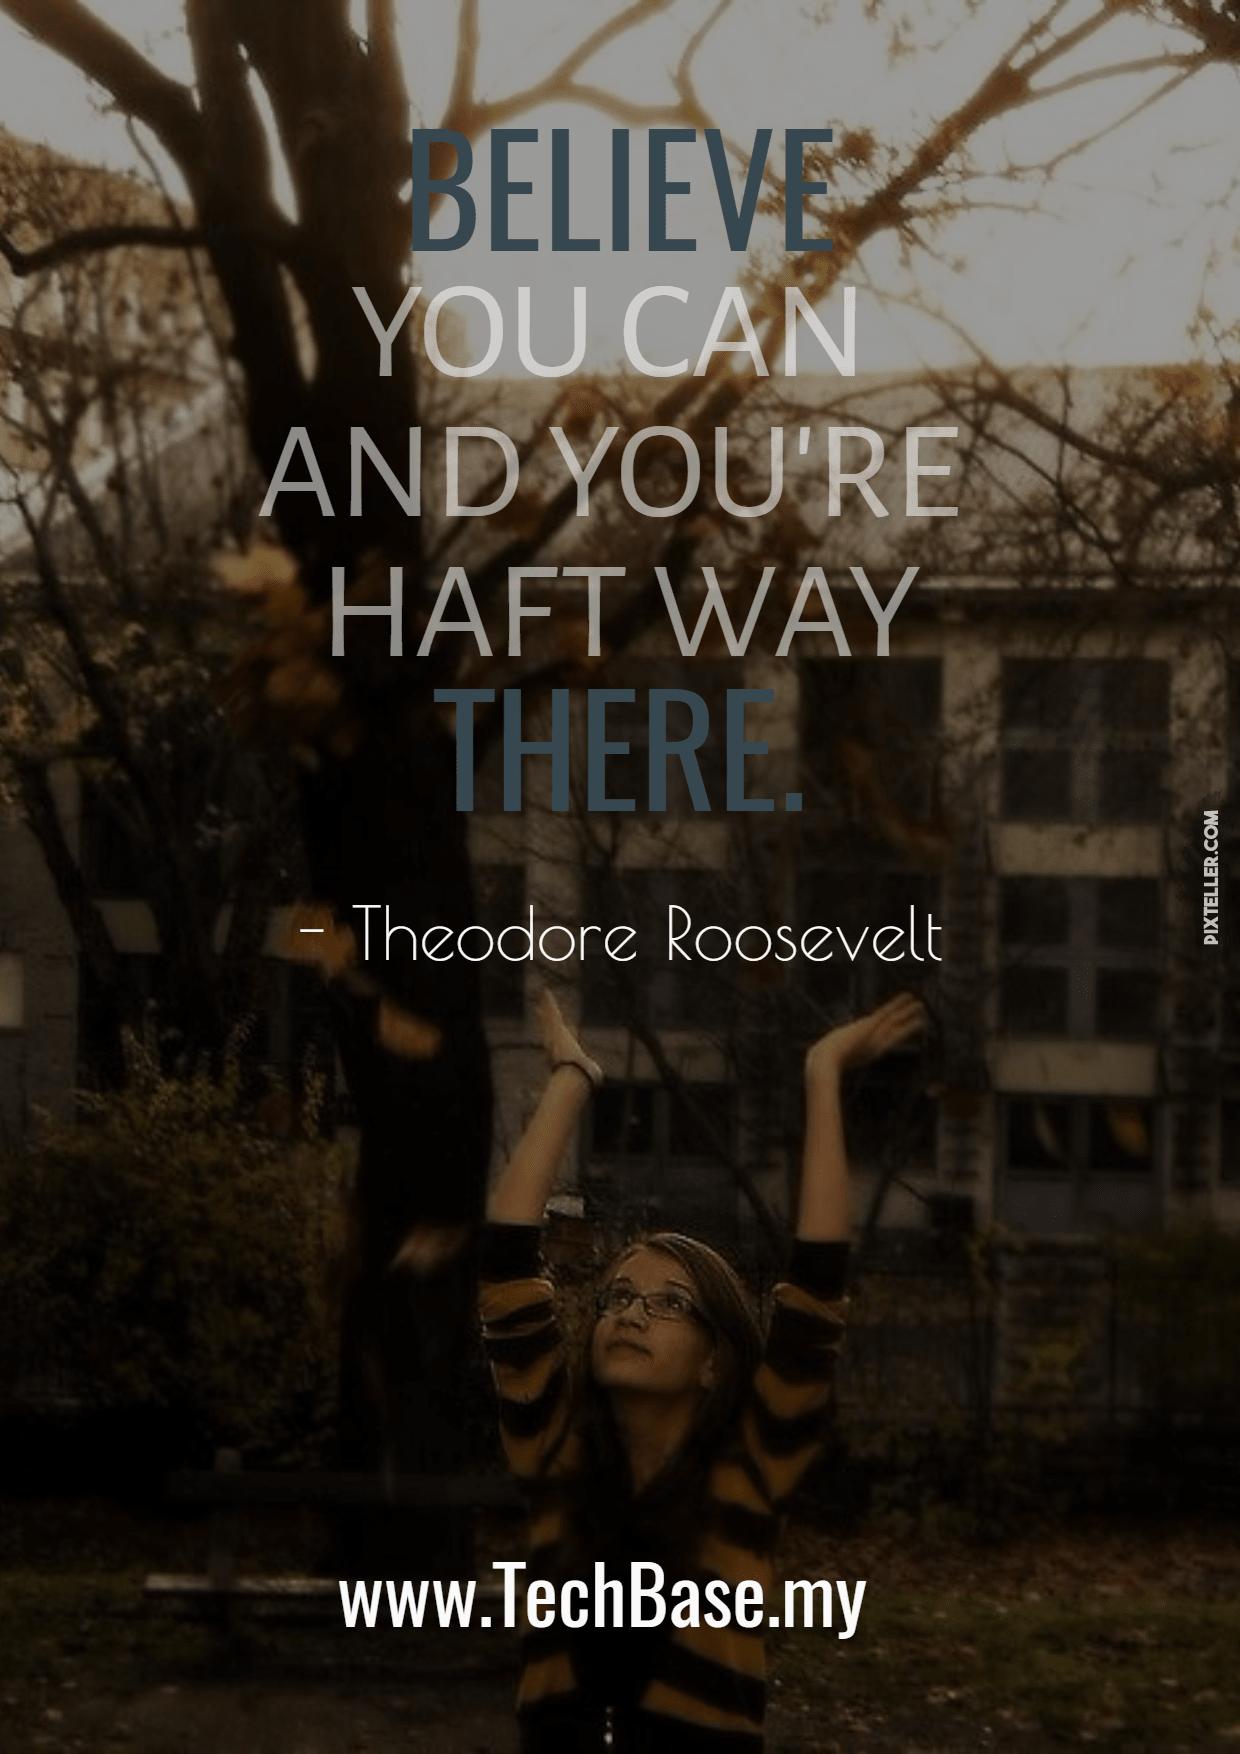 Screenshot,                Fiction,                Simple,                Love,                Poster,                White,                Black,                 Free Image